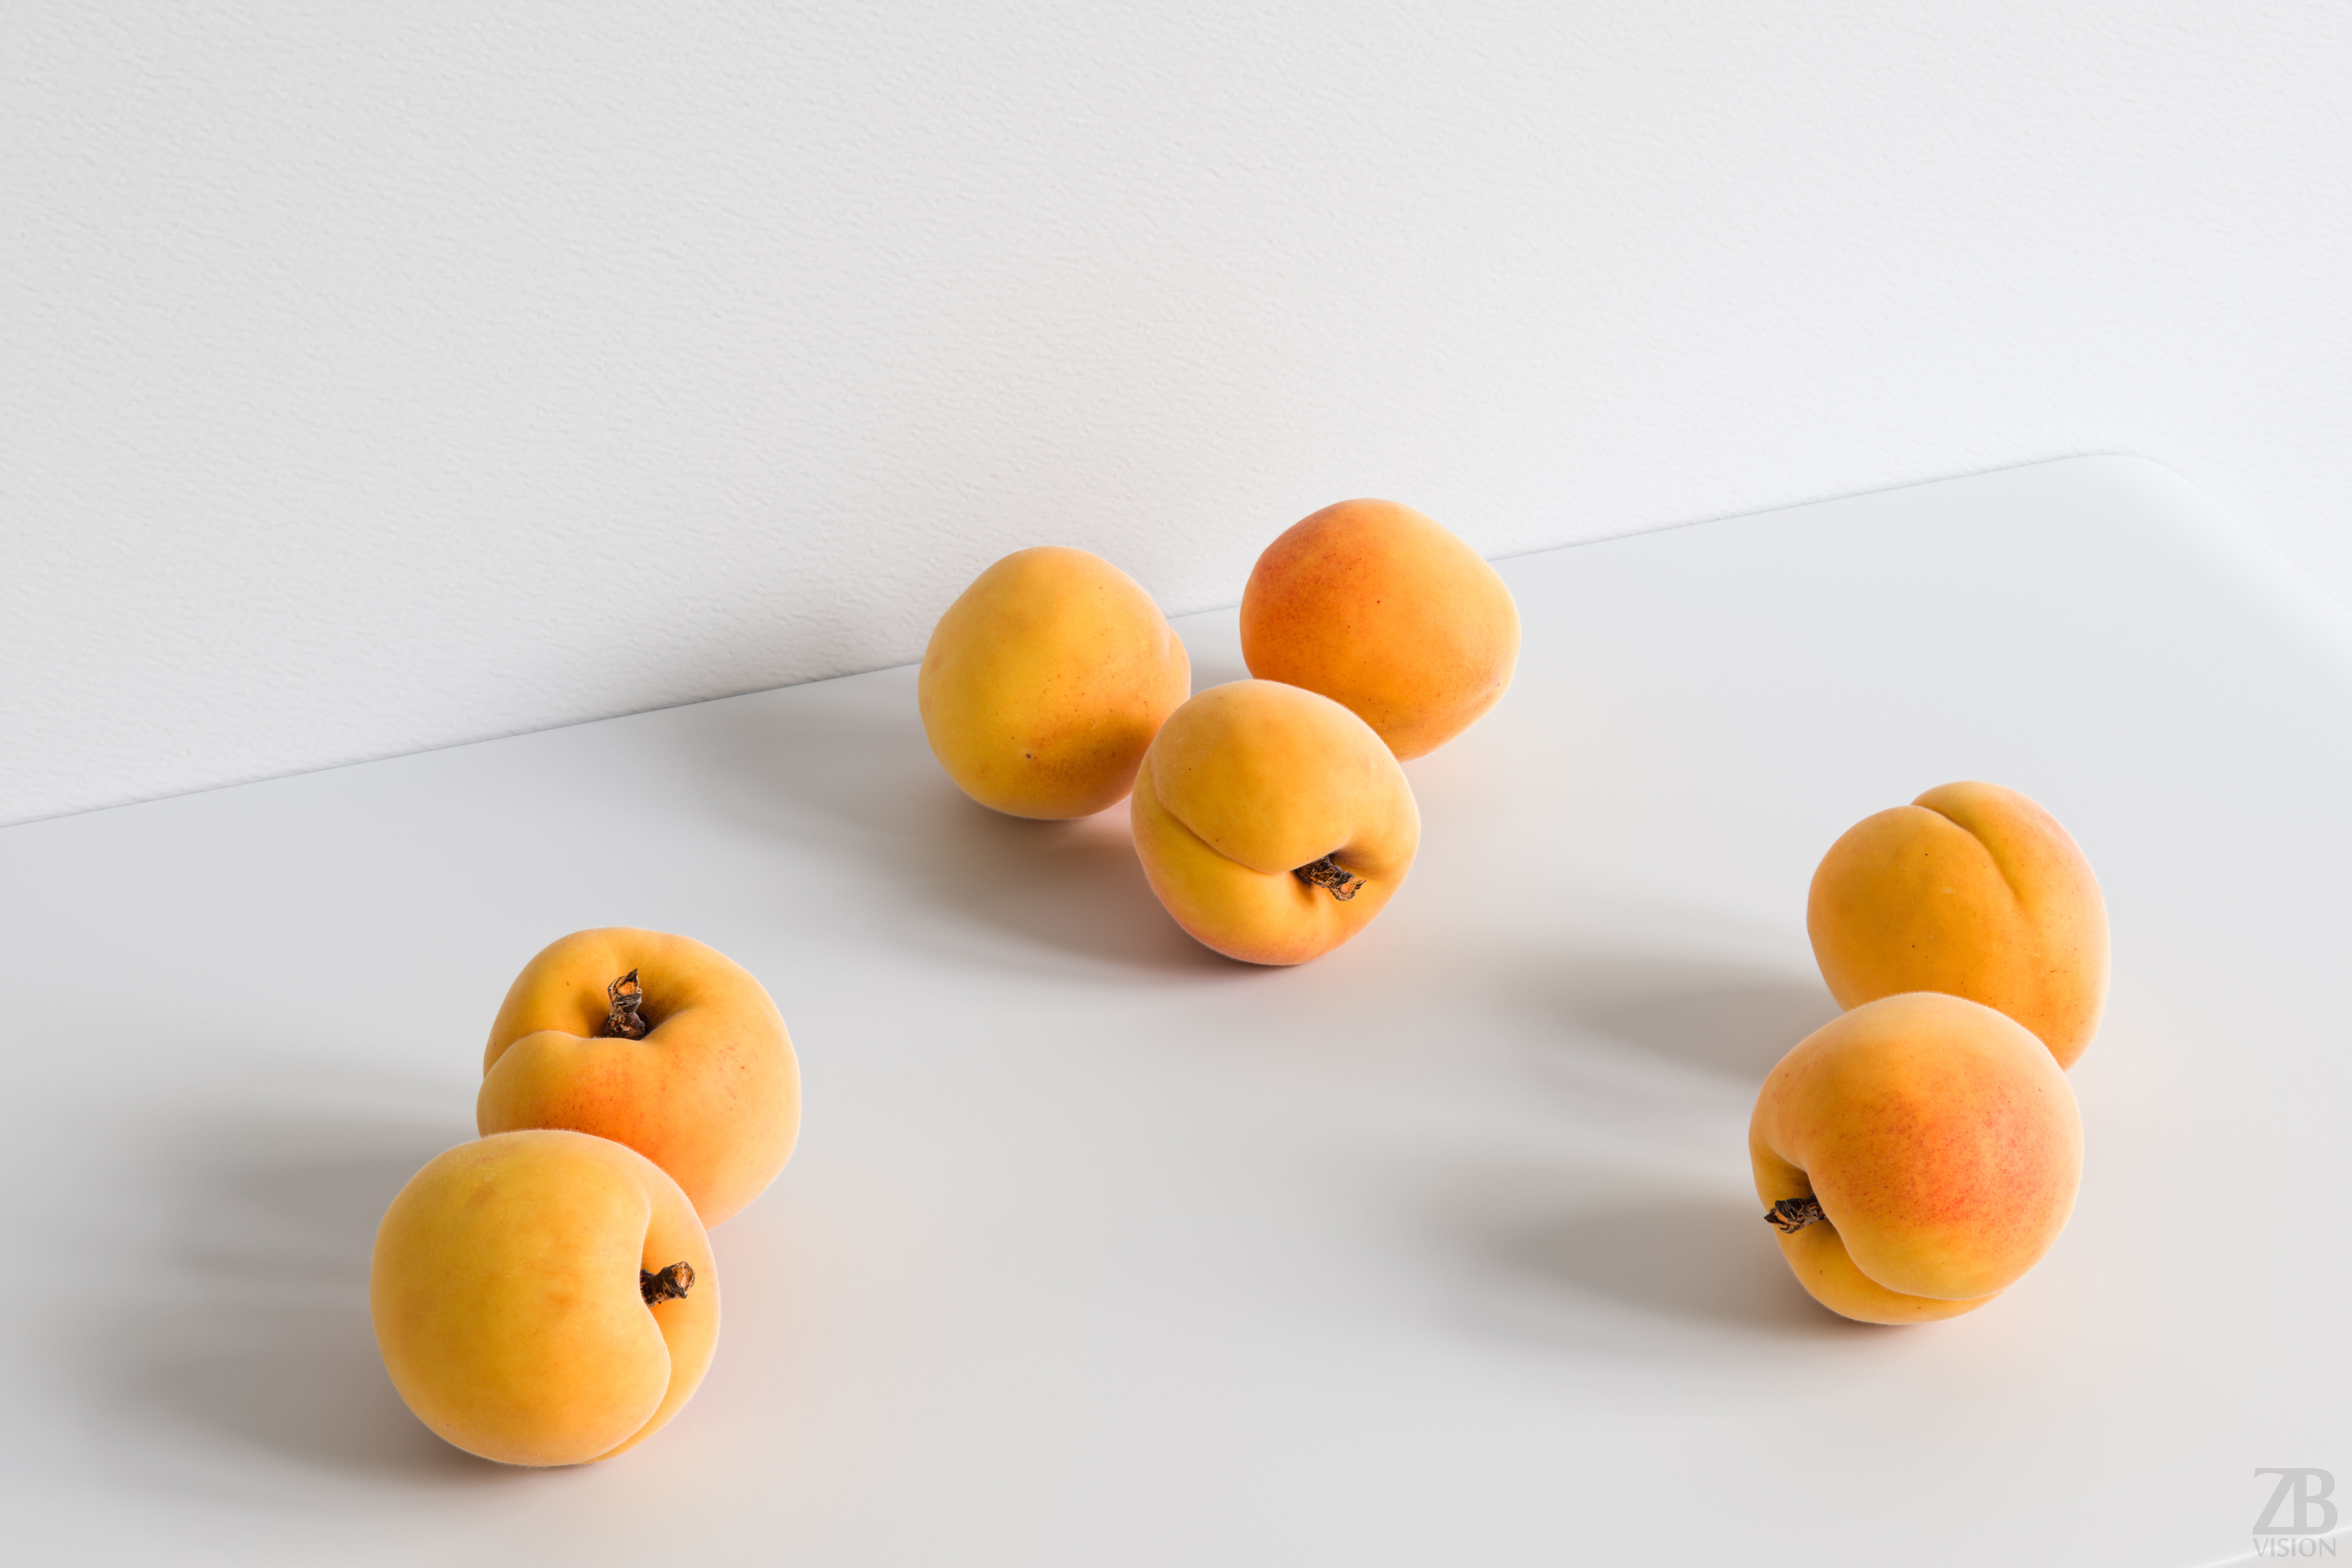 Apricot 001